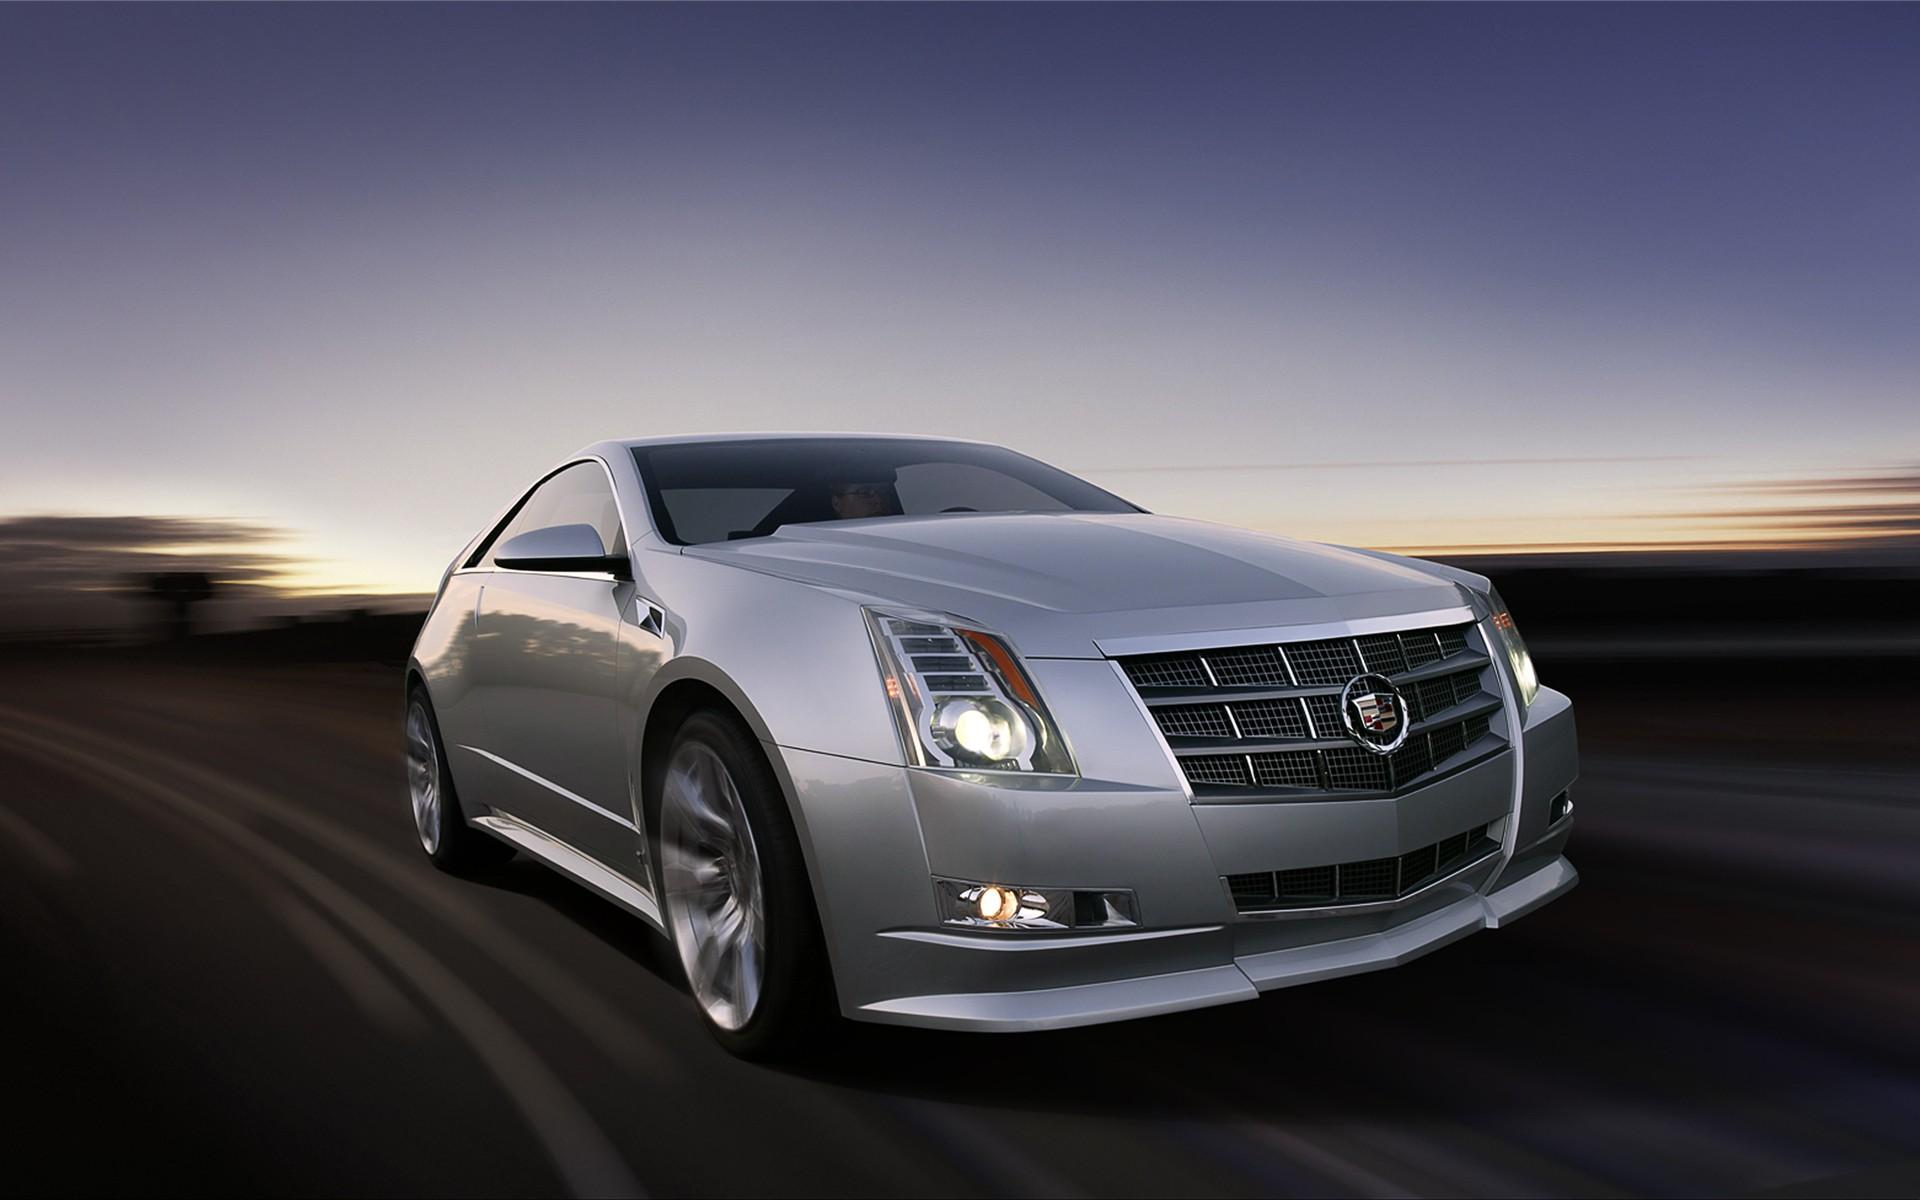 Best Cadillac Cars